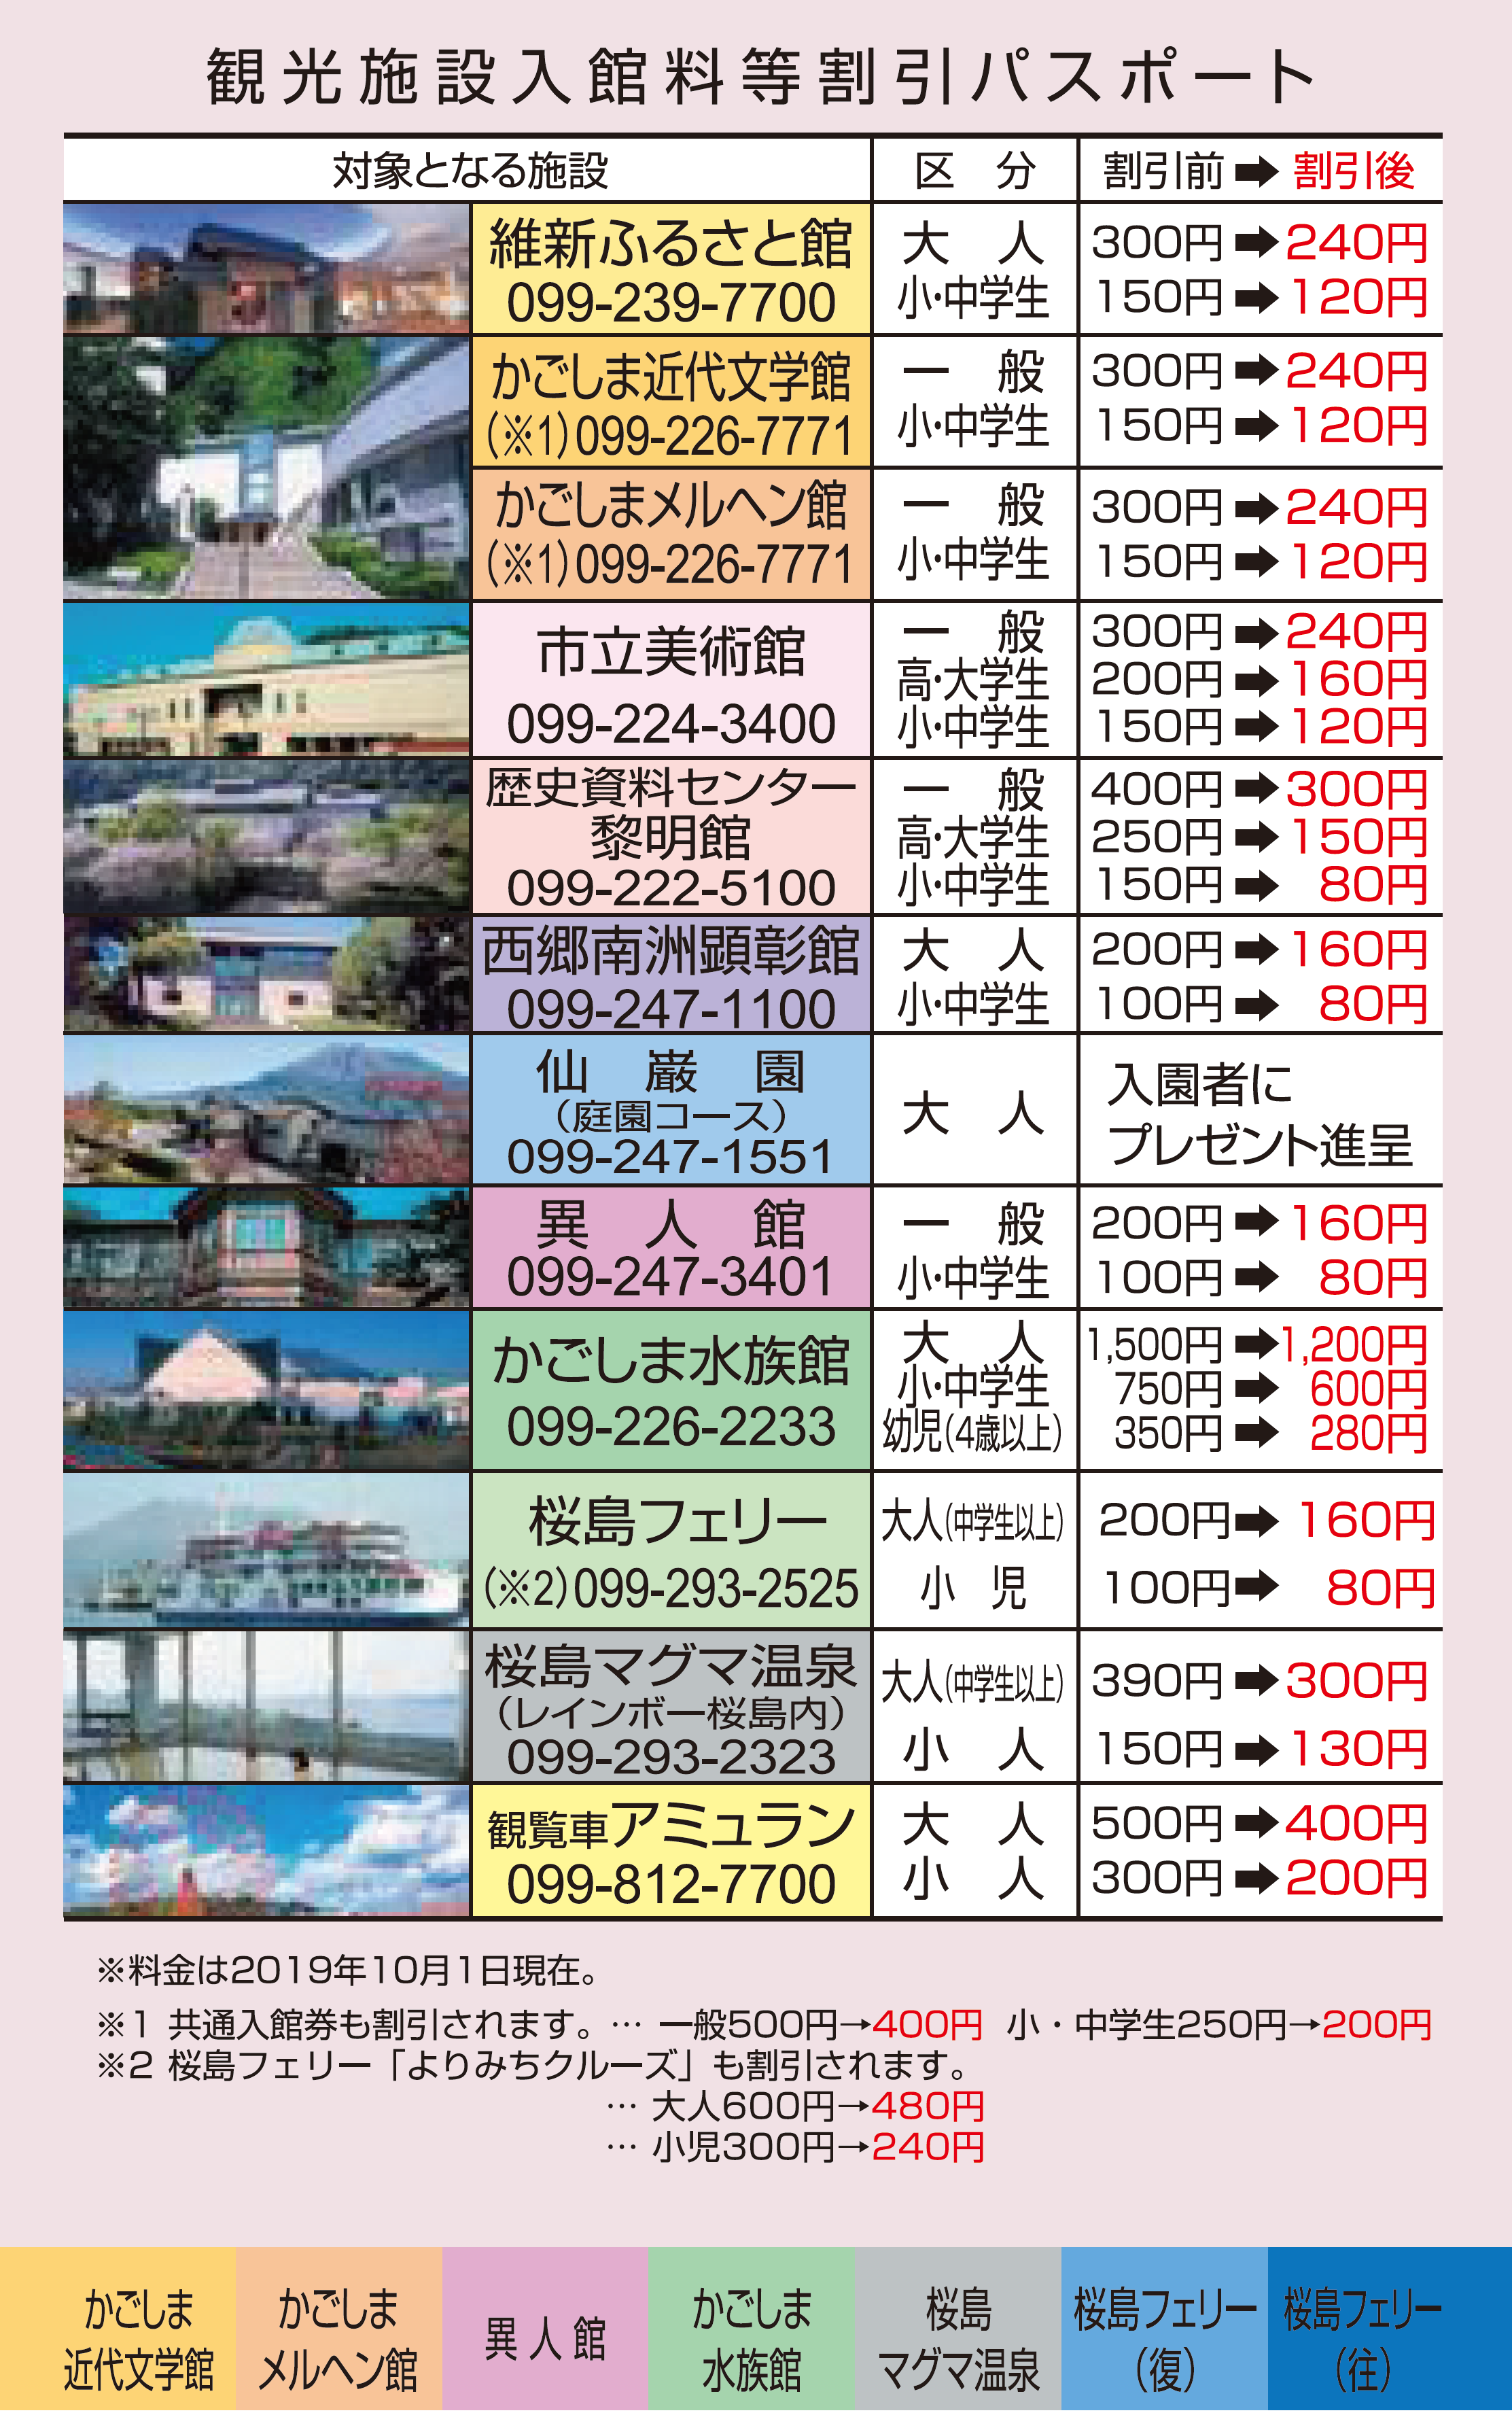 http://www.kotsu-city-kagoshima.jp/wp/wp-content/uploads/2012/10/5411abb17222e2df3b89770afb9092bf.png